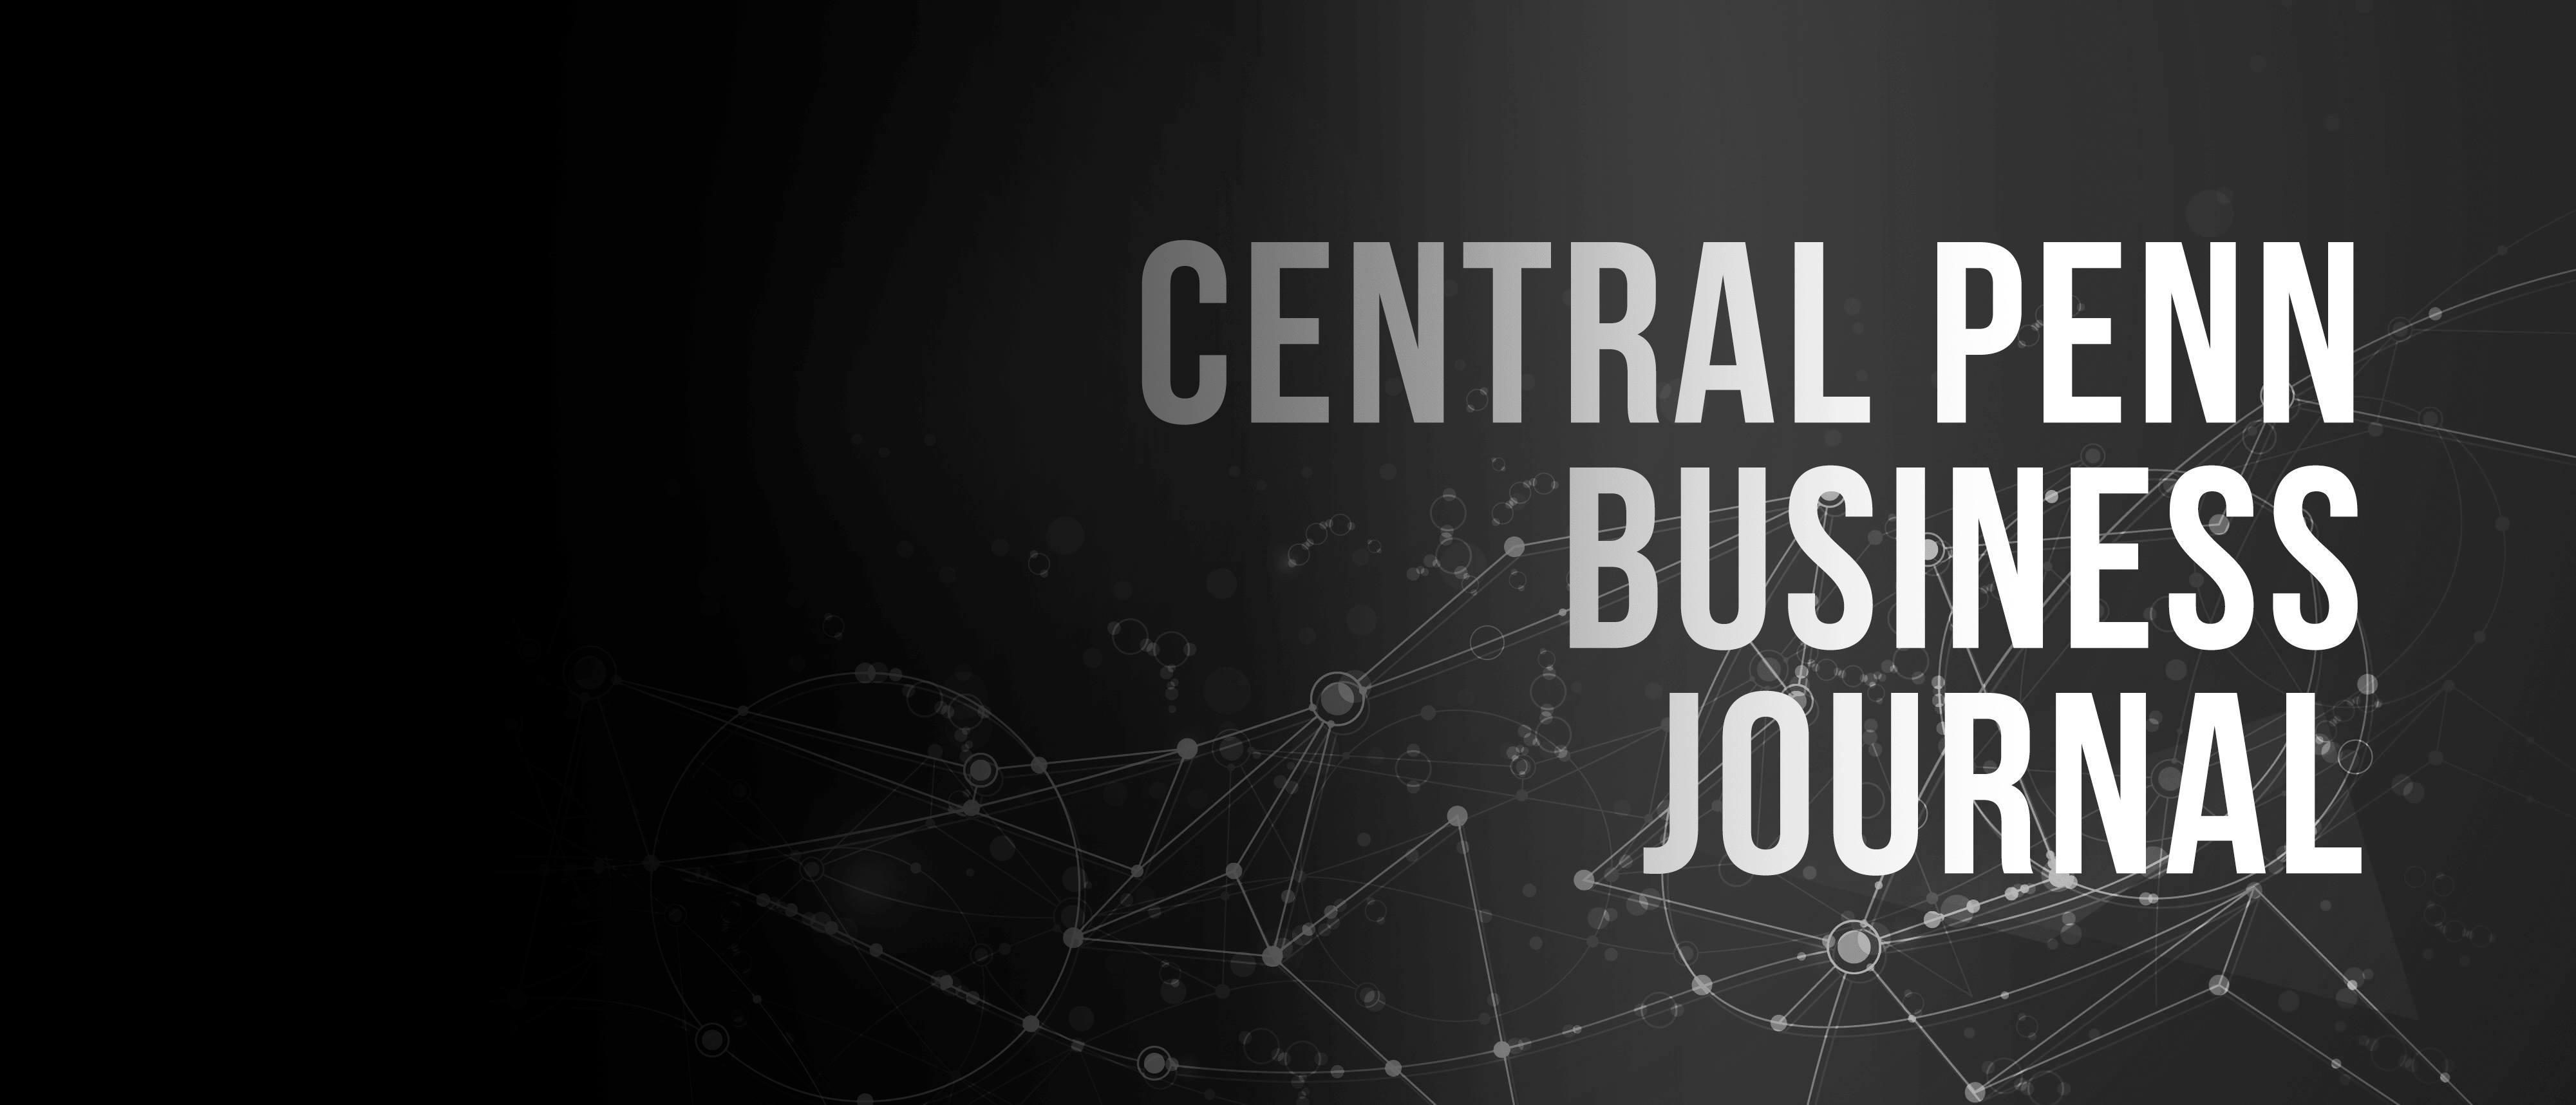 Central Penn Business Journal-min